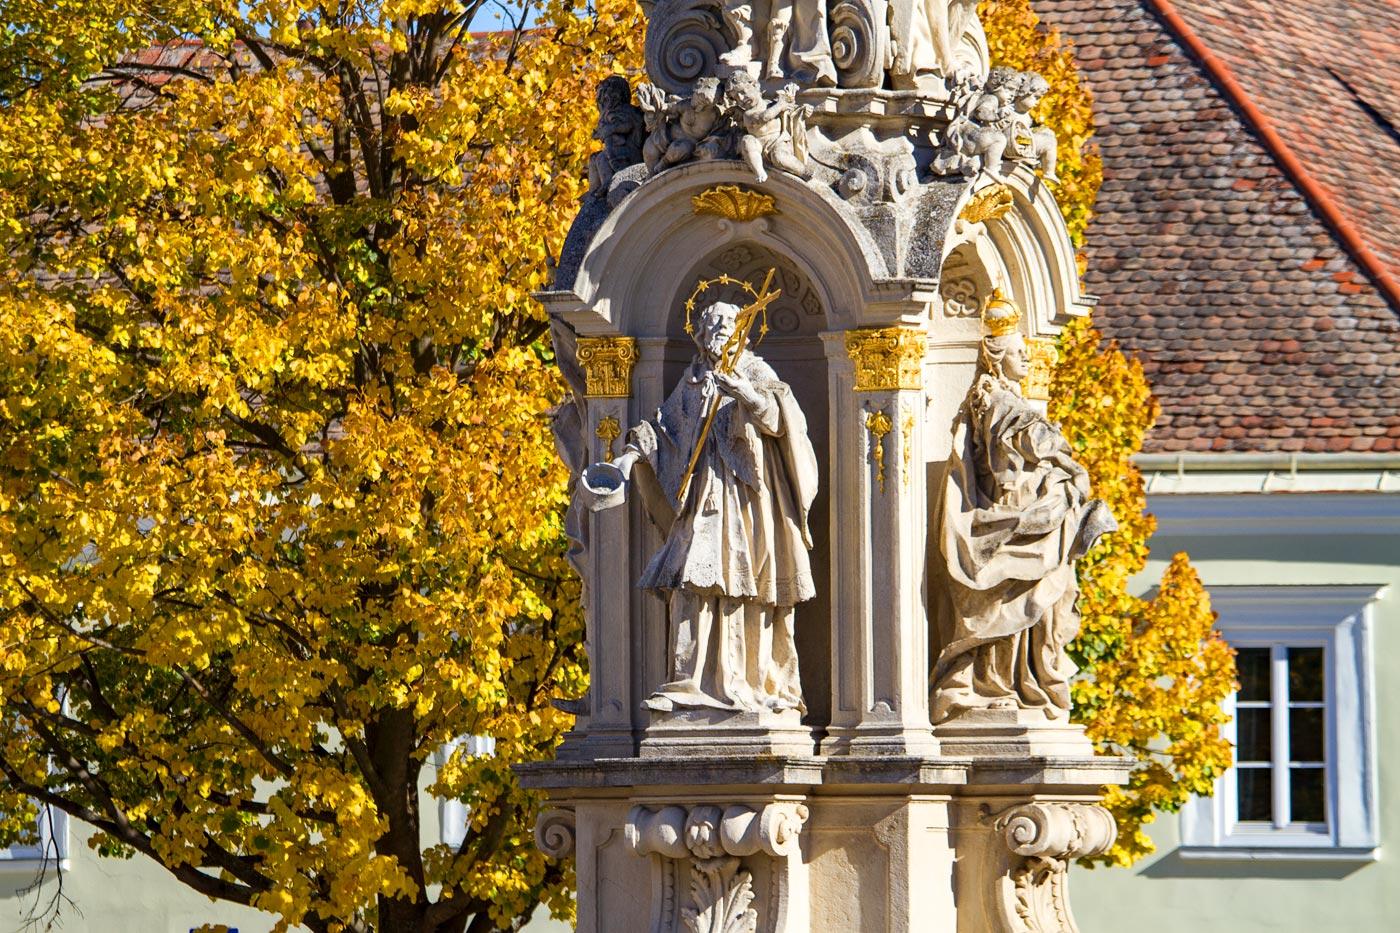 Рец (Retz), приграничная Австрия